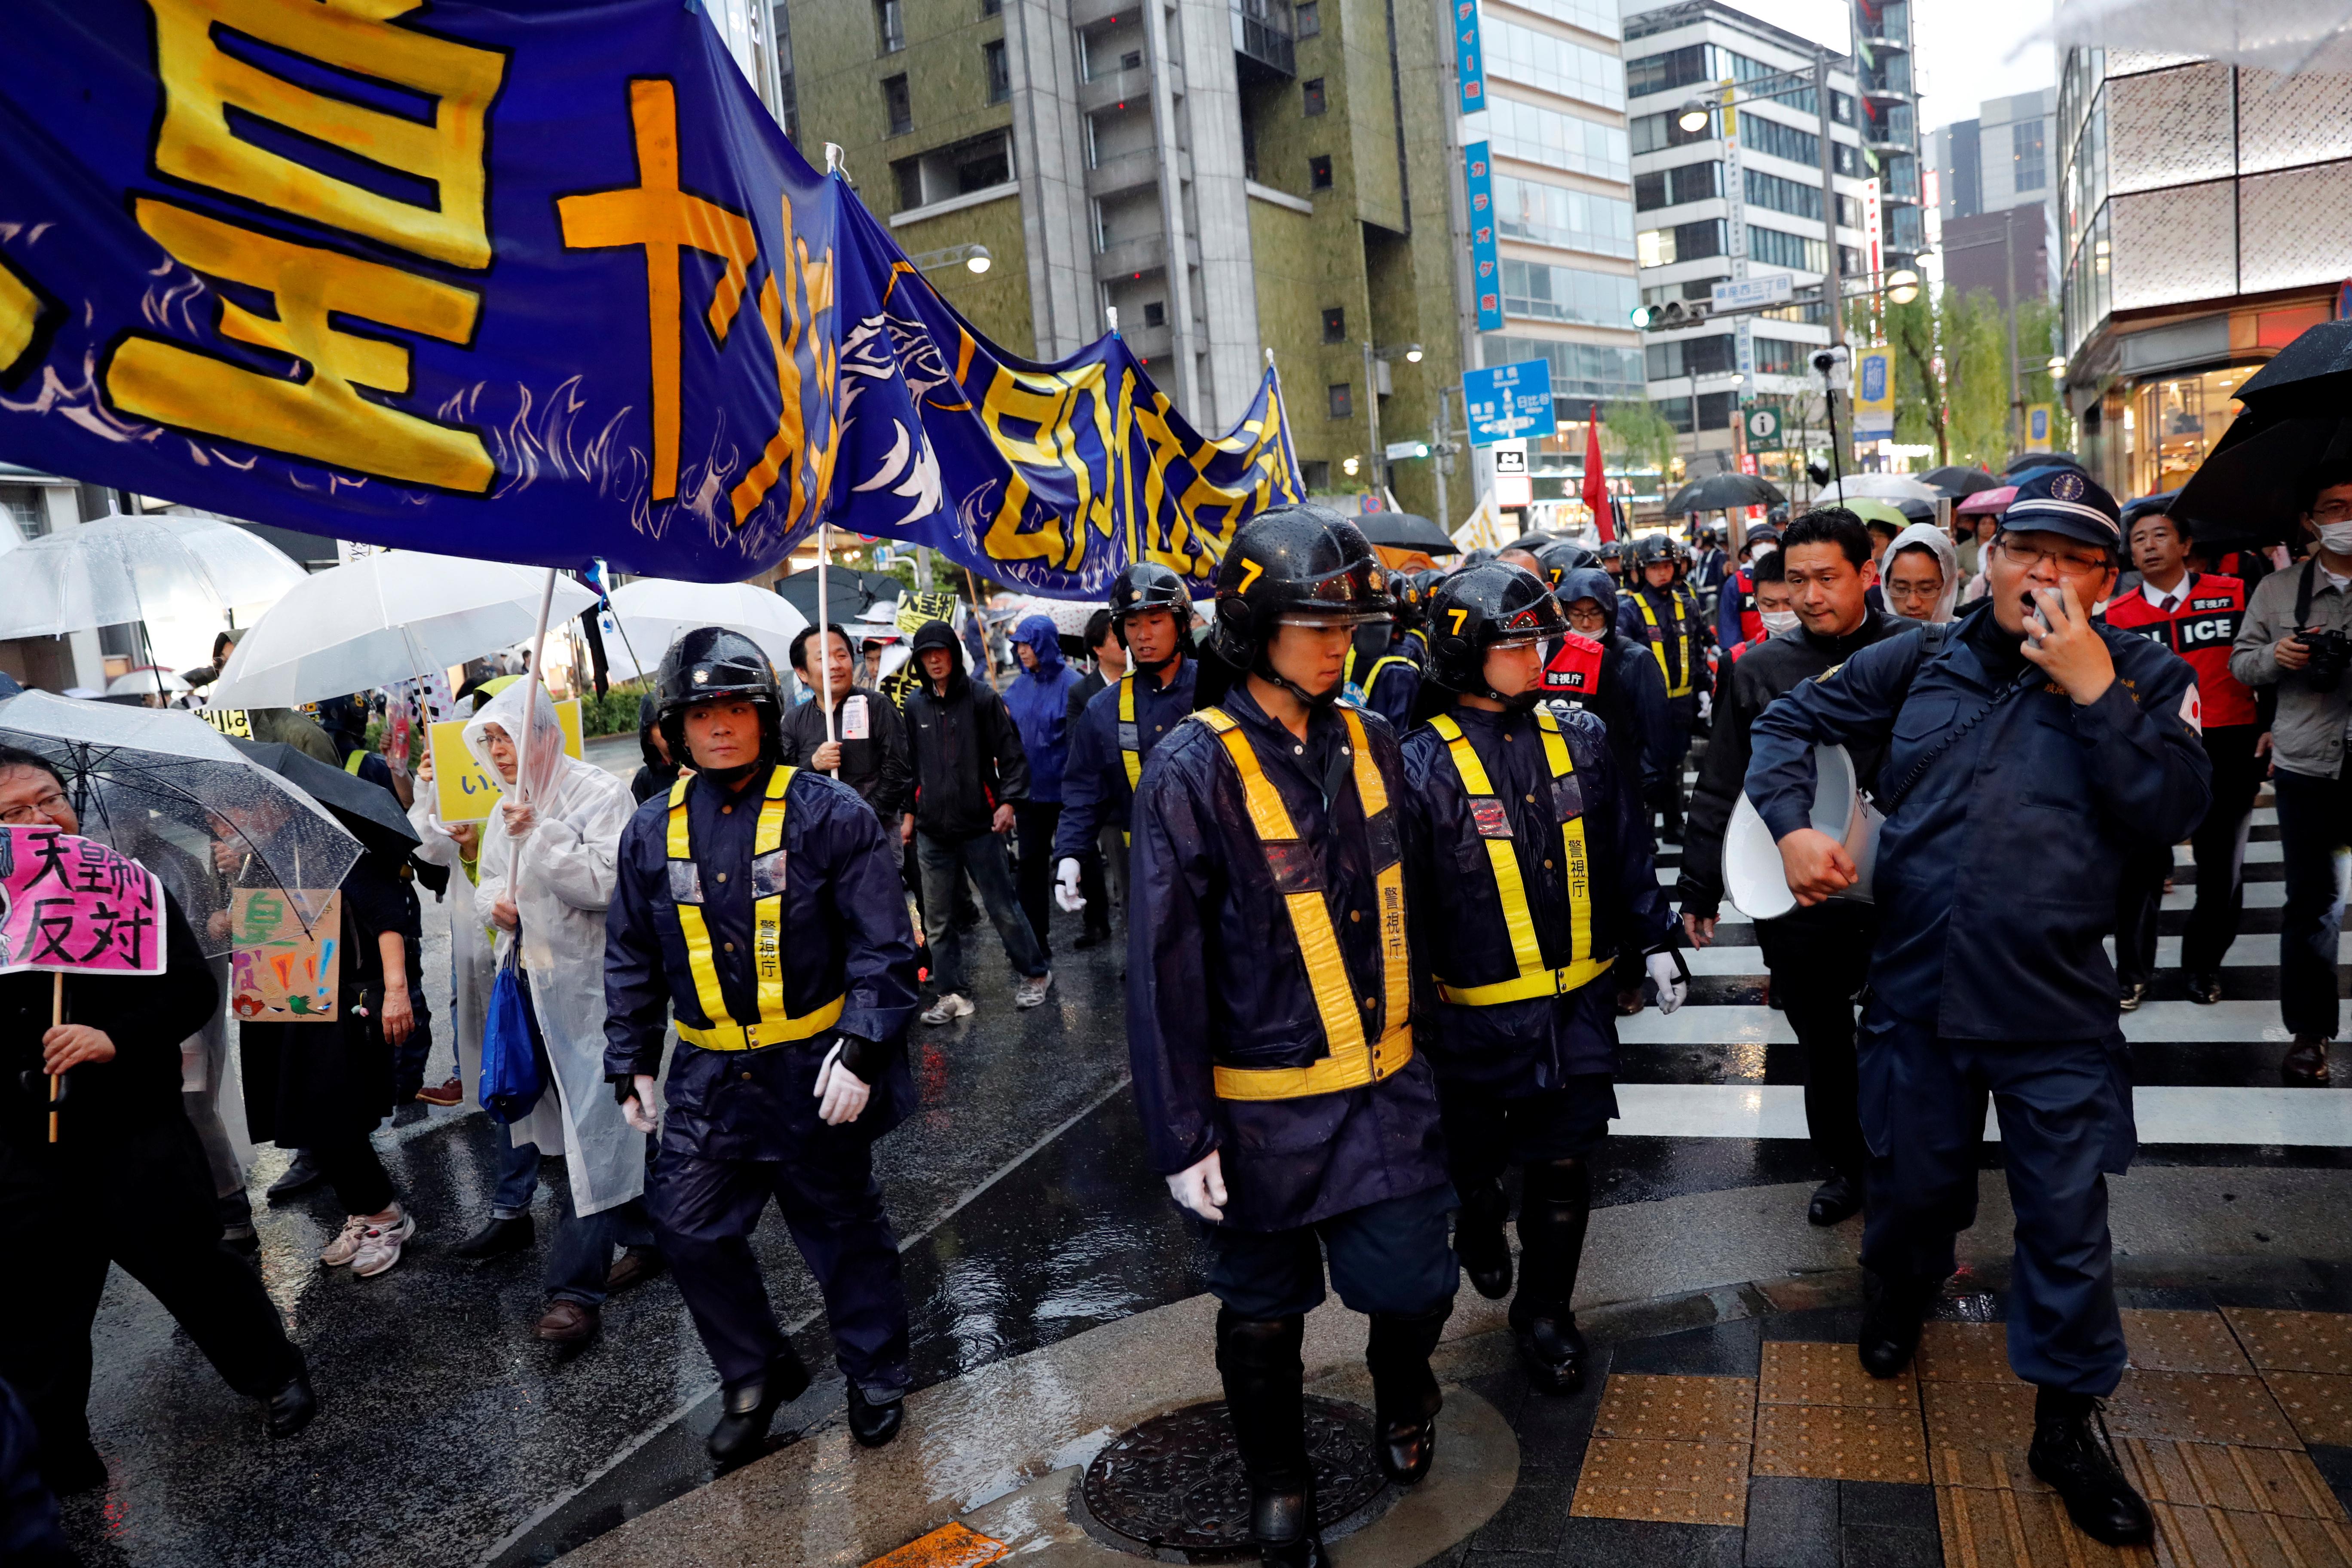 2019-05-01T092257Z_1298453378_RC1B6E626A20_RTRMADP_3_JAPAN-EMPEROR-PROTEST